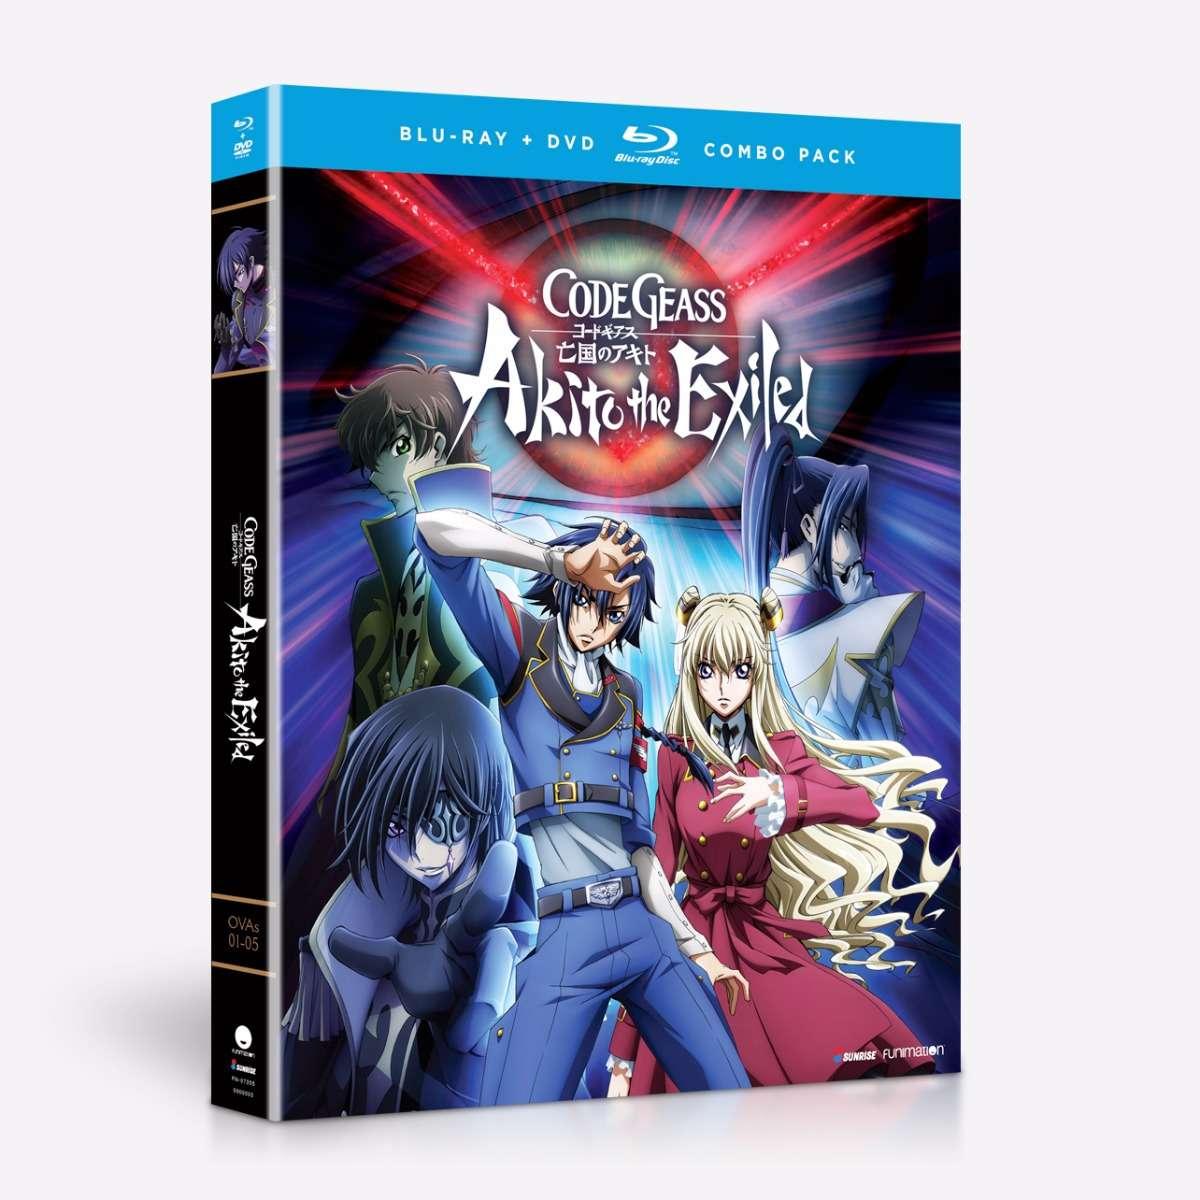 OVA Series - BD/DVD Combo home-video